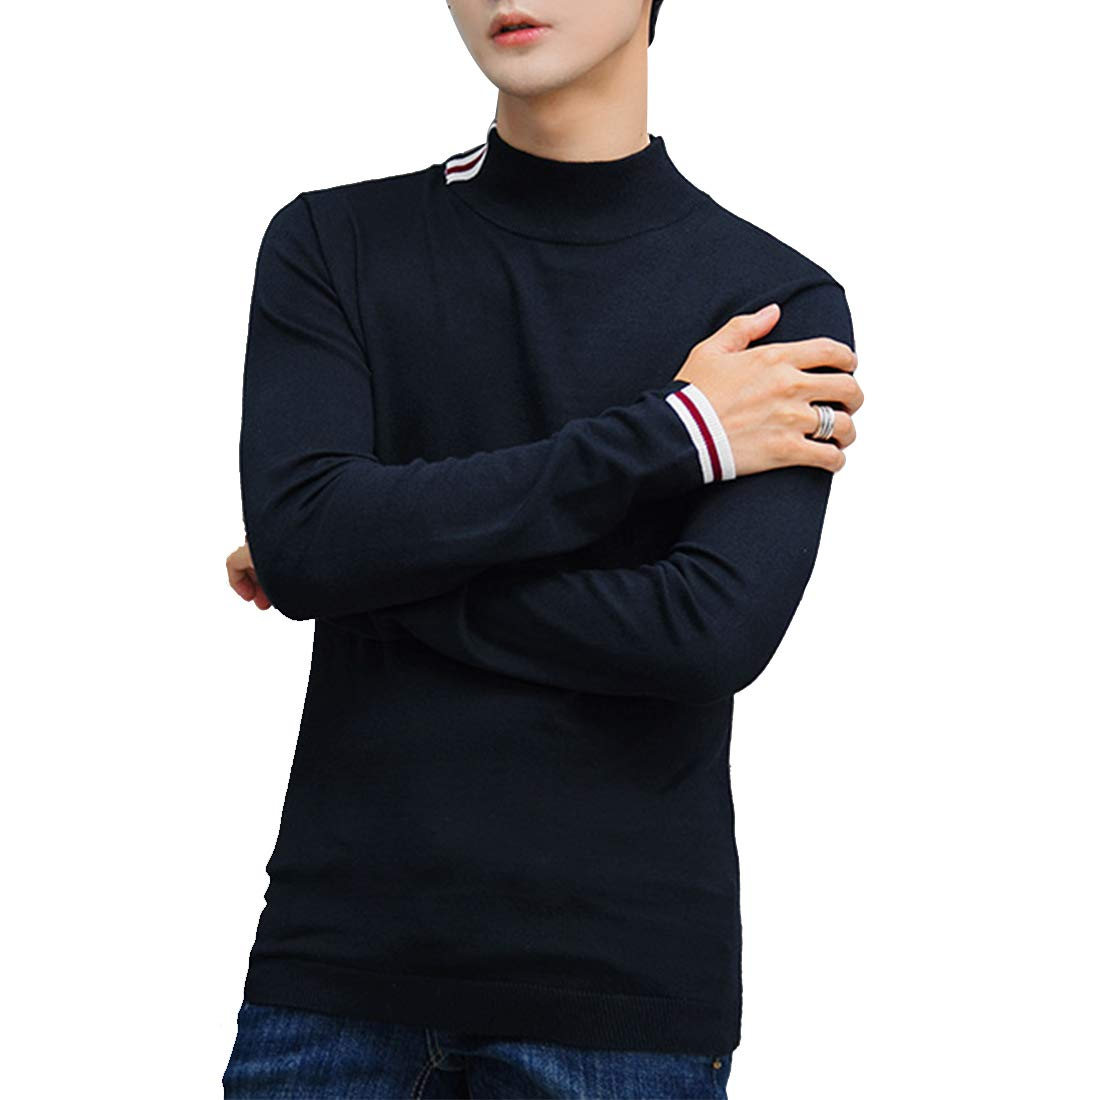 9f1b1b920 ... Fepelasi Suéter de Color sólido sólido sólido para Hombre